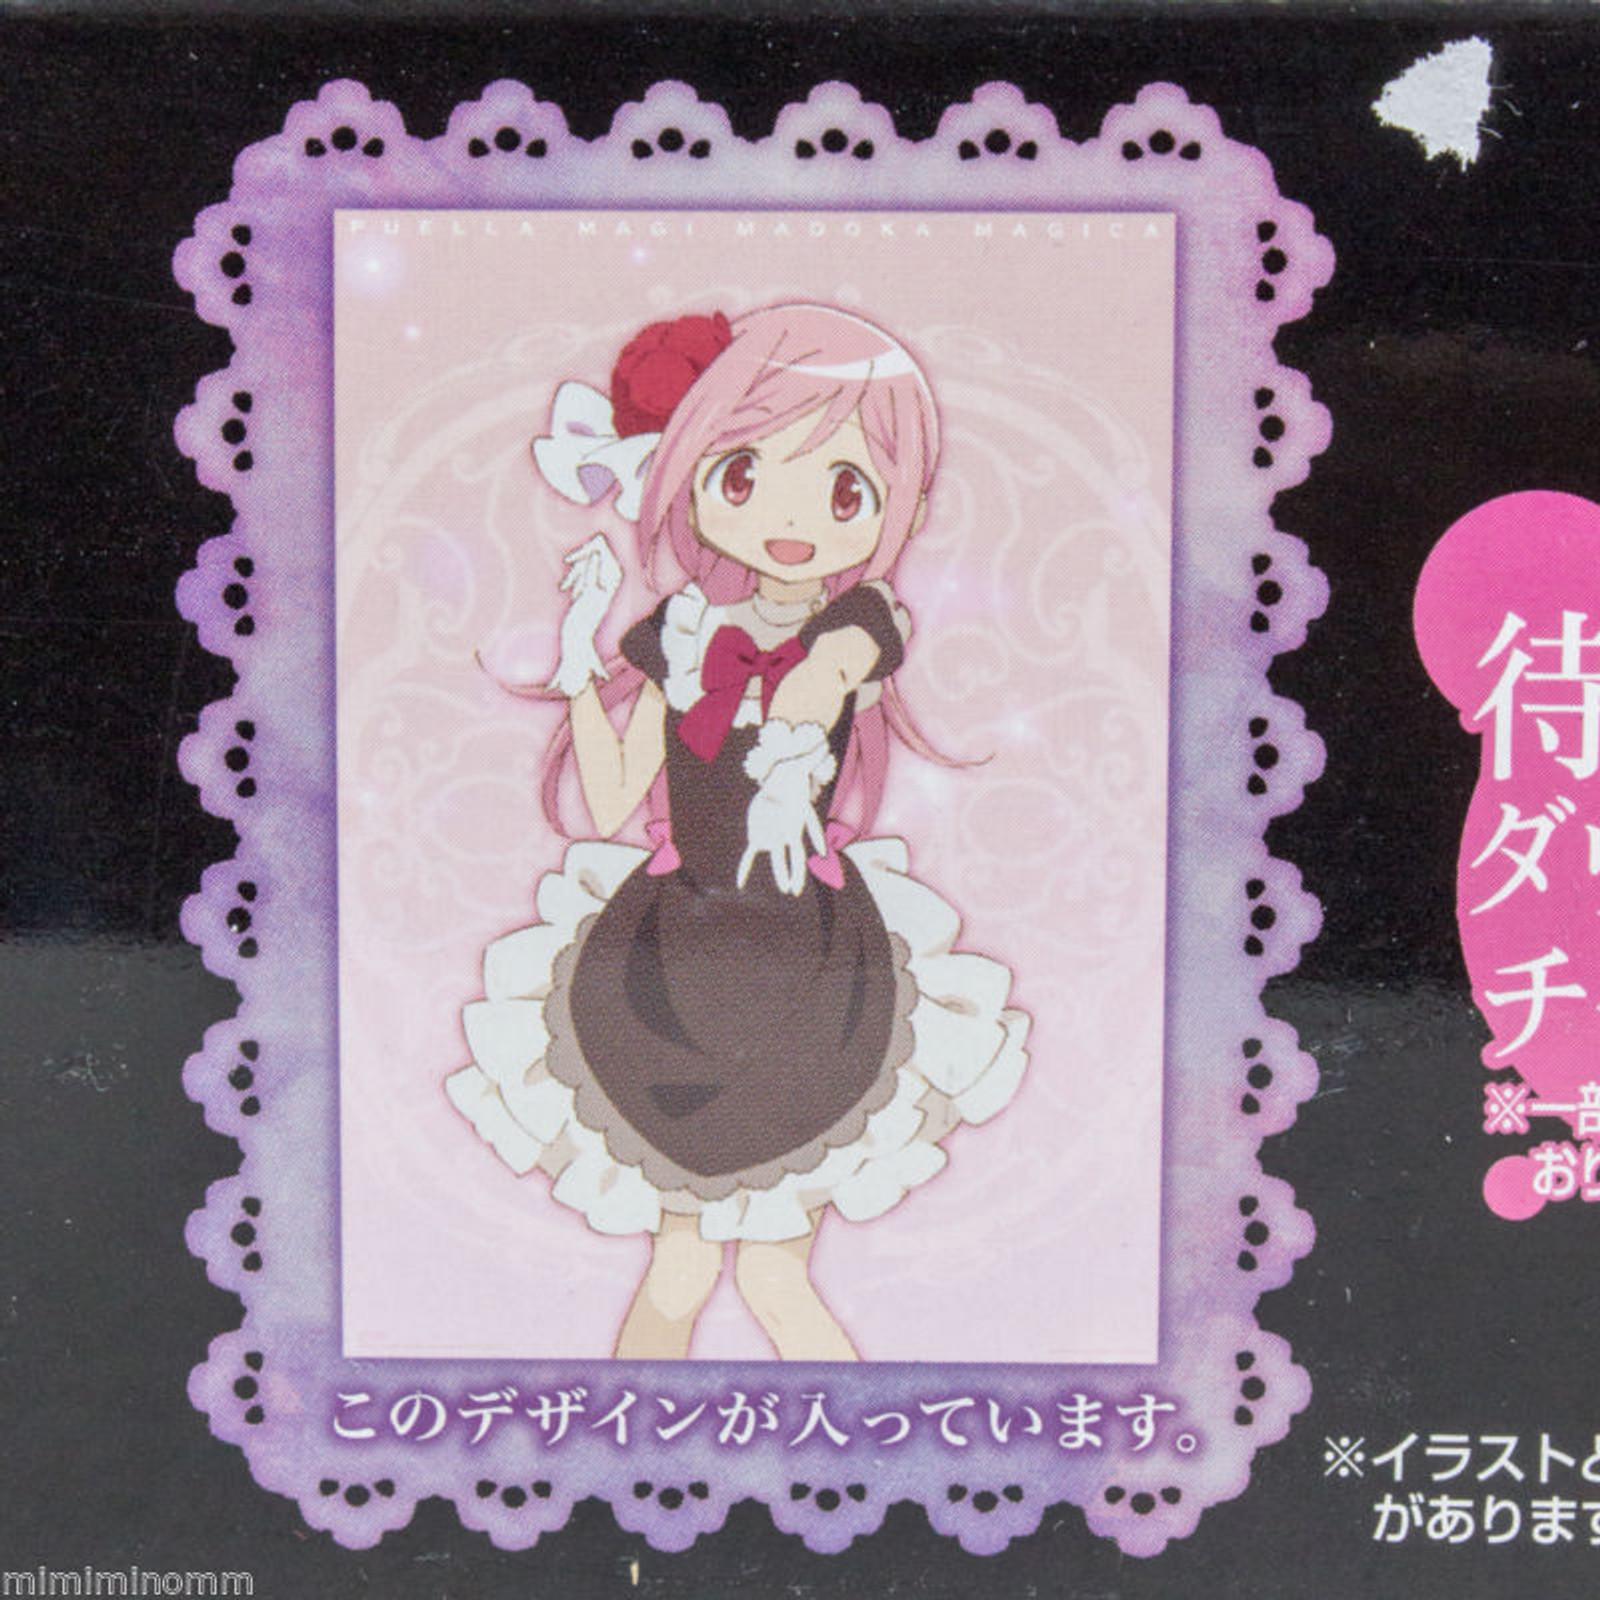 Puella Magi Madoka Magica Madoka Kaname A2 Size Poster Banpresto JAPAN ANIME